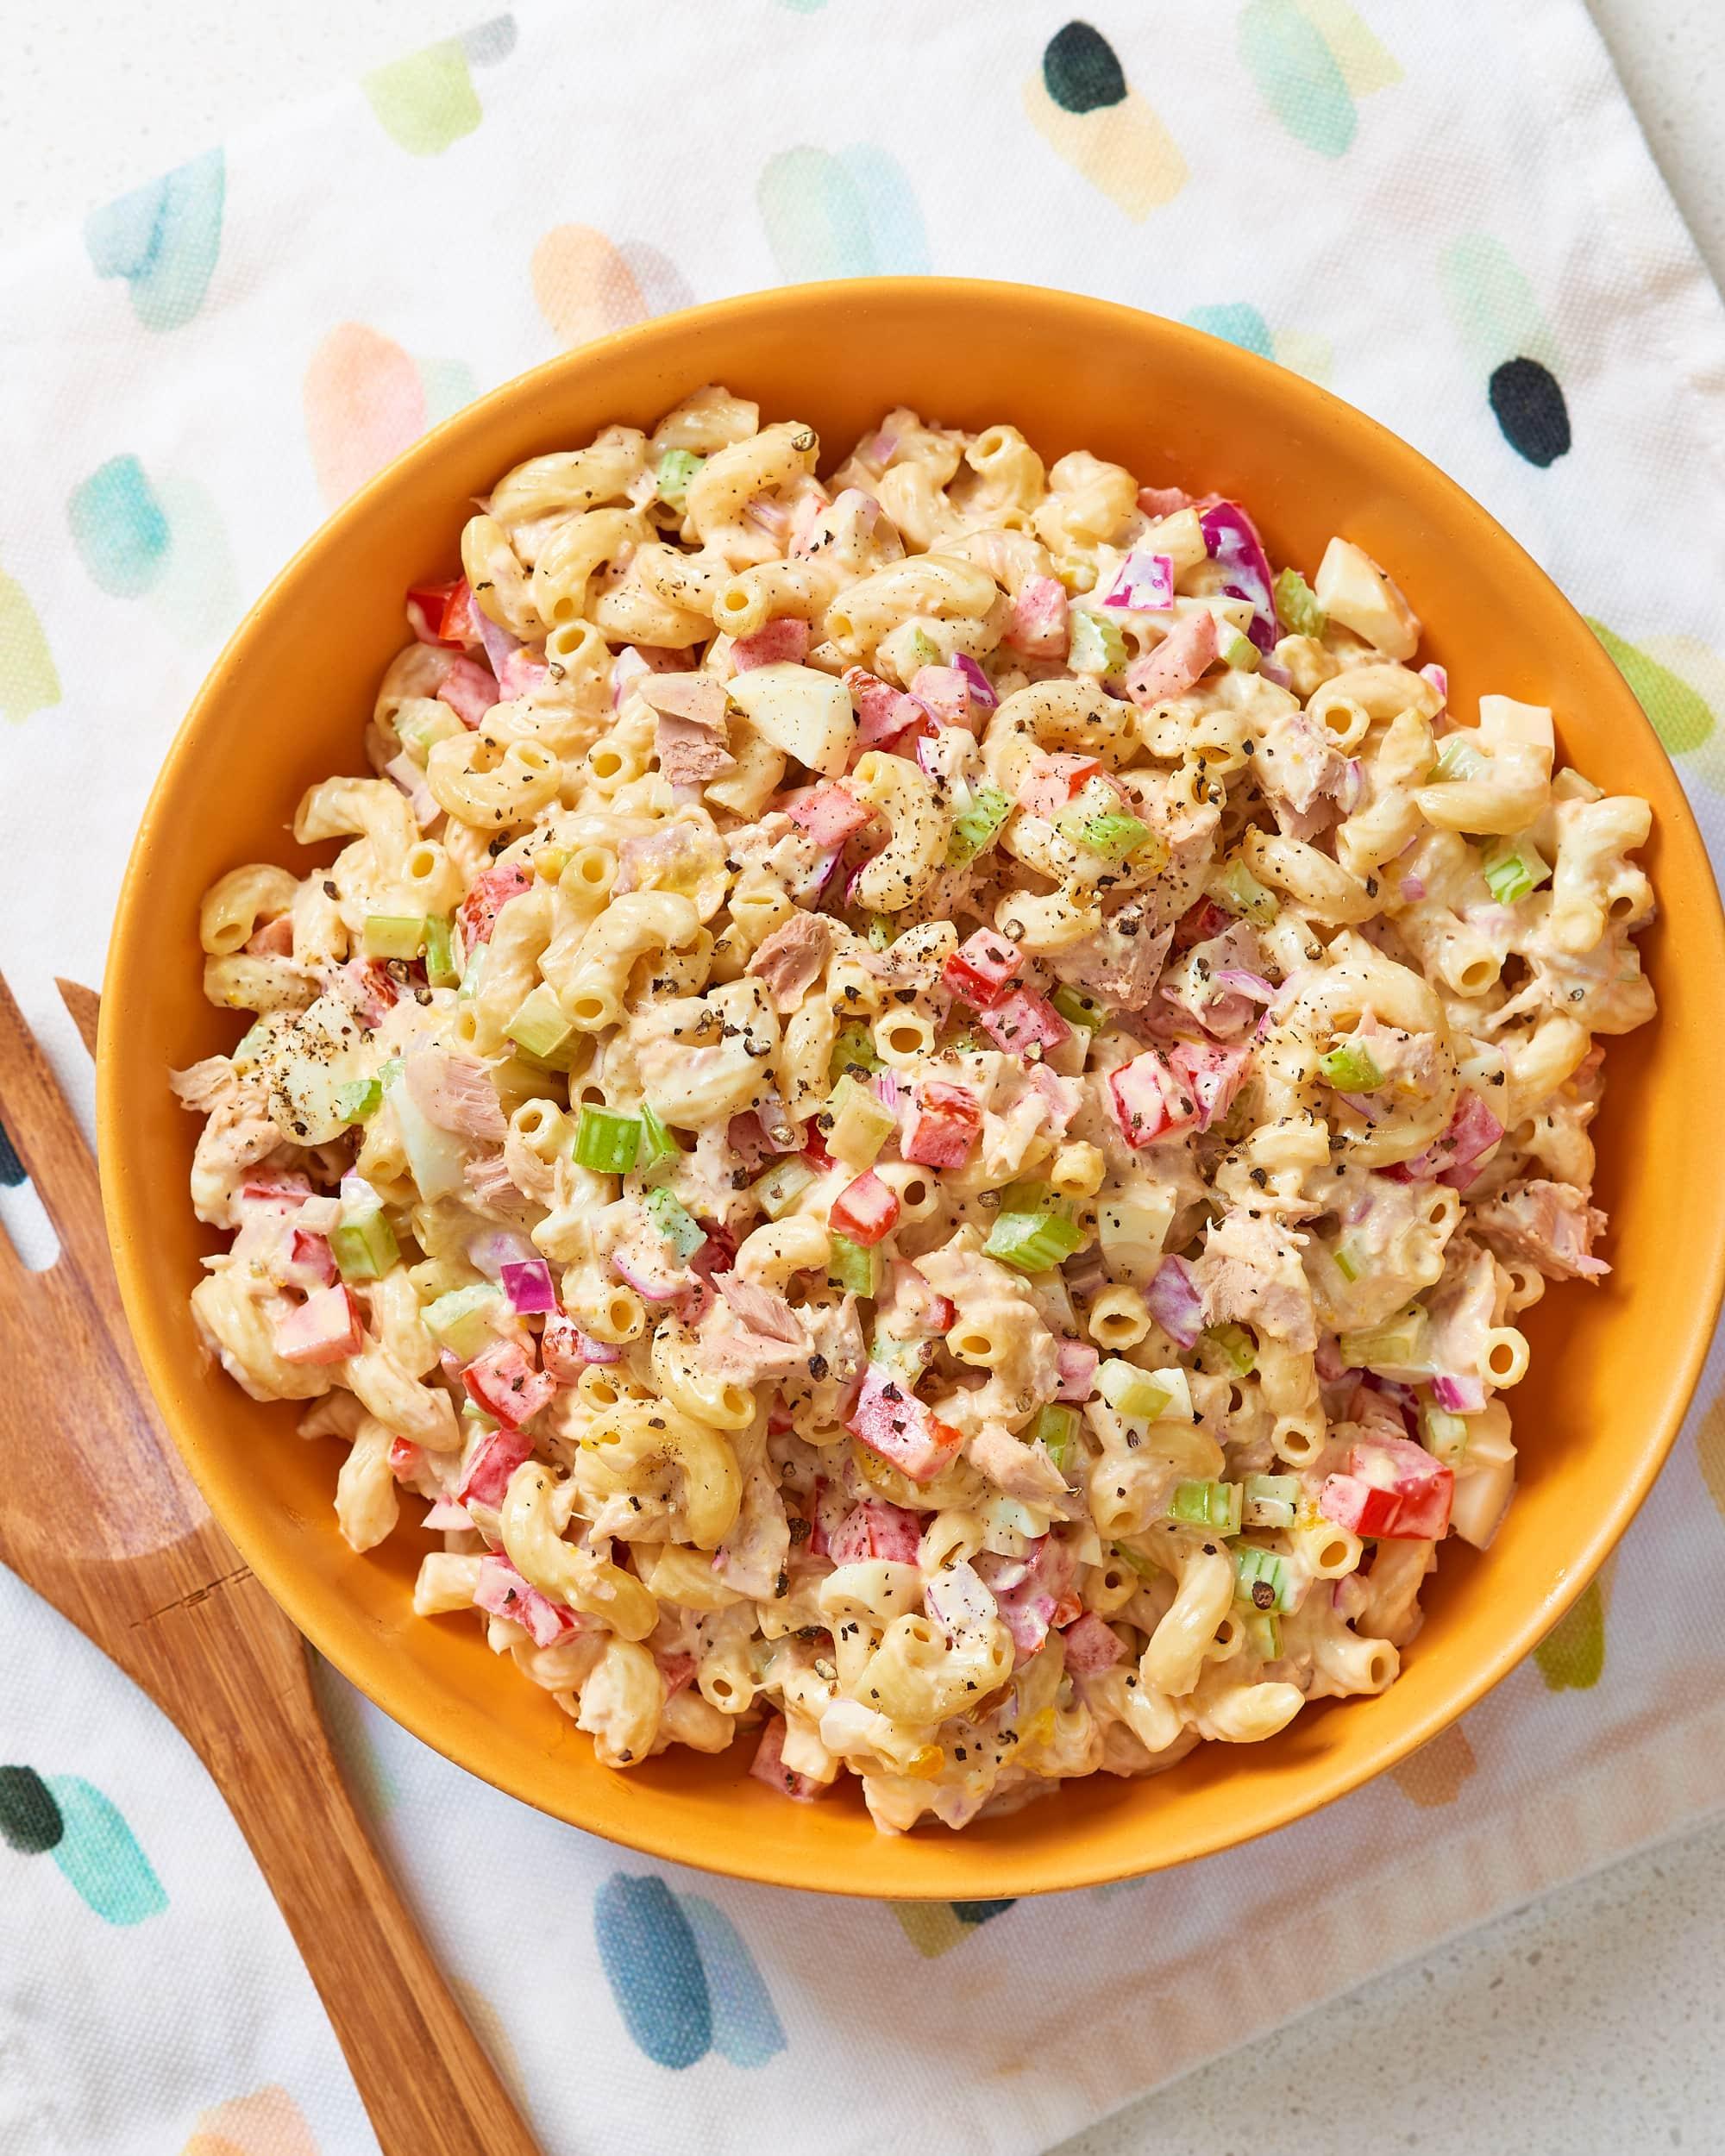 How To Make Better Classic Tuna Macaroni Salad